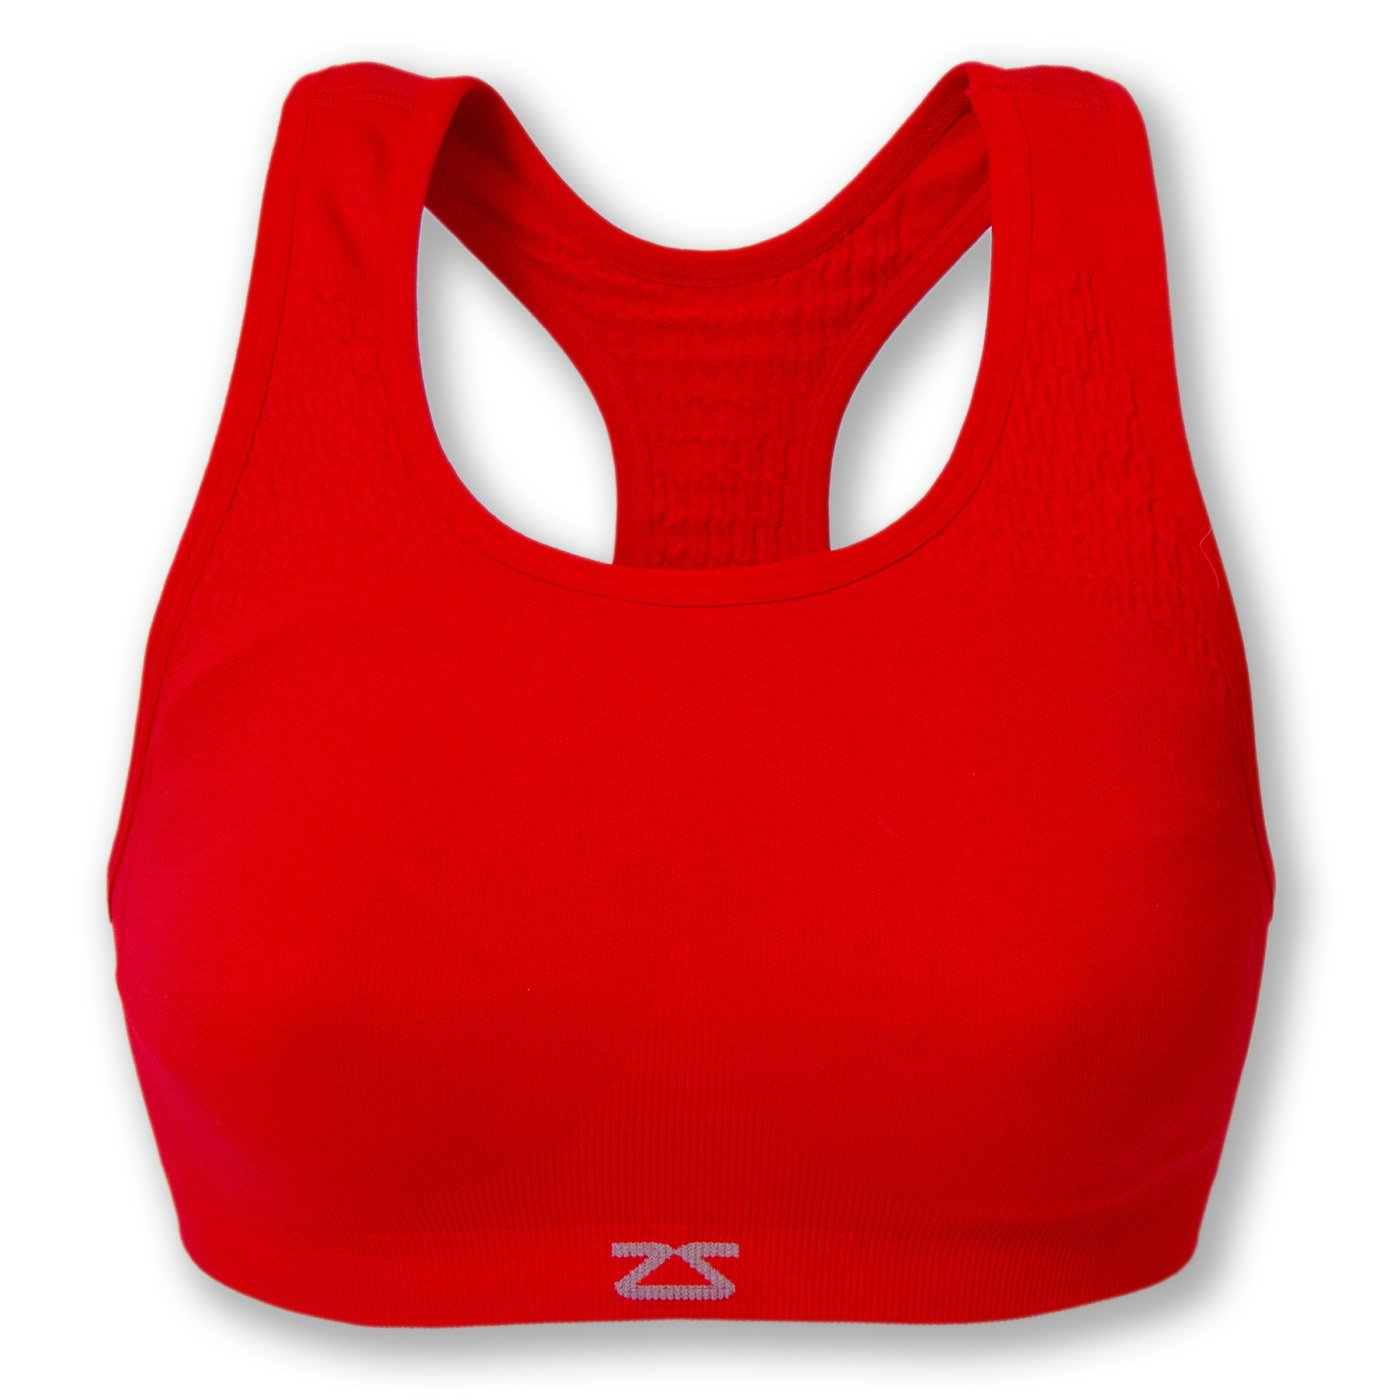 Zensah Women's Seamless Sports Bra, Womens, Seamless Bra